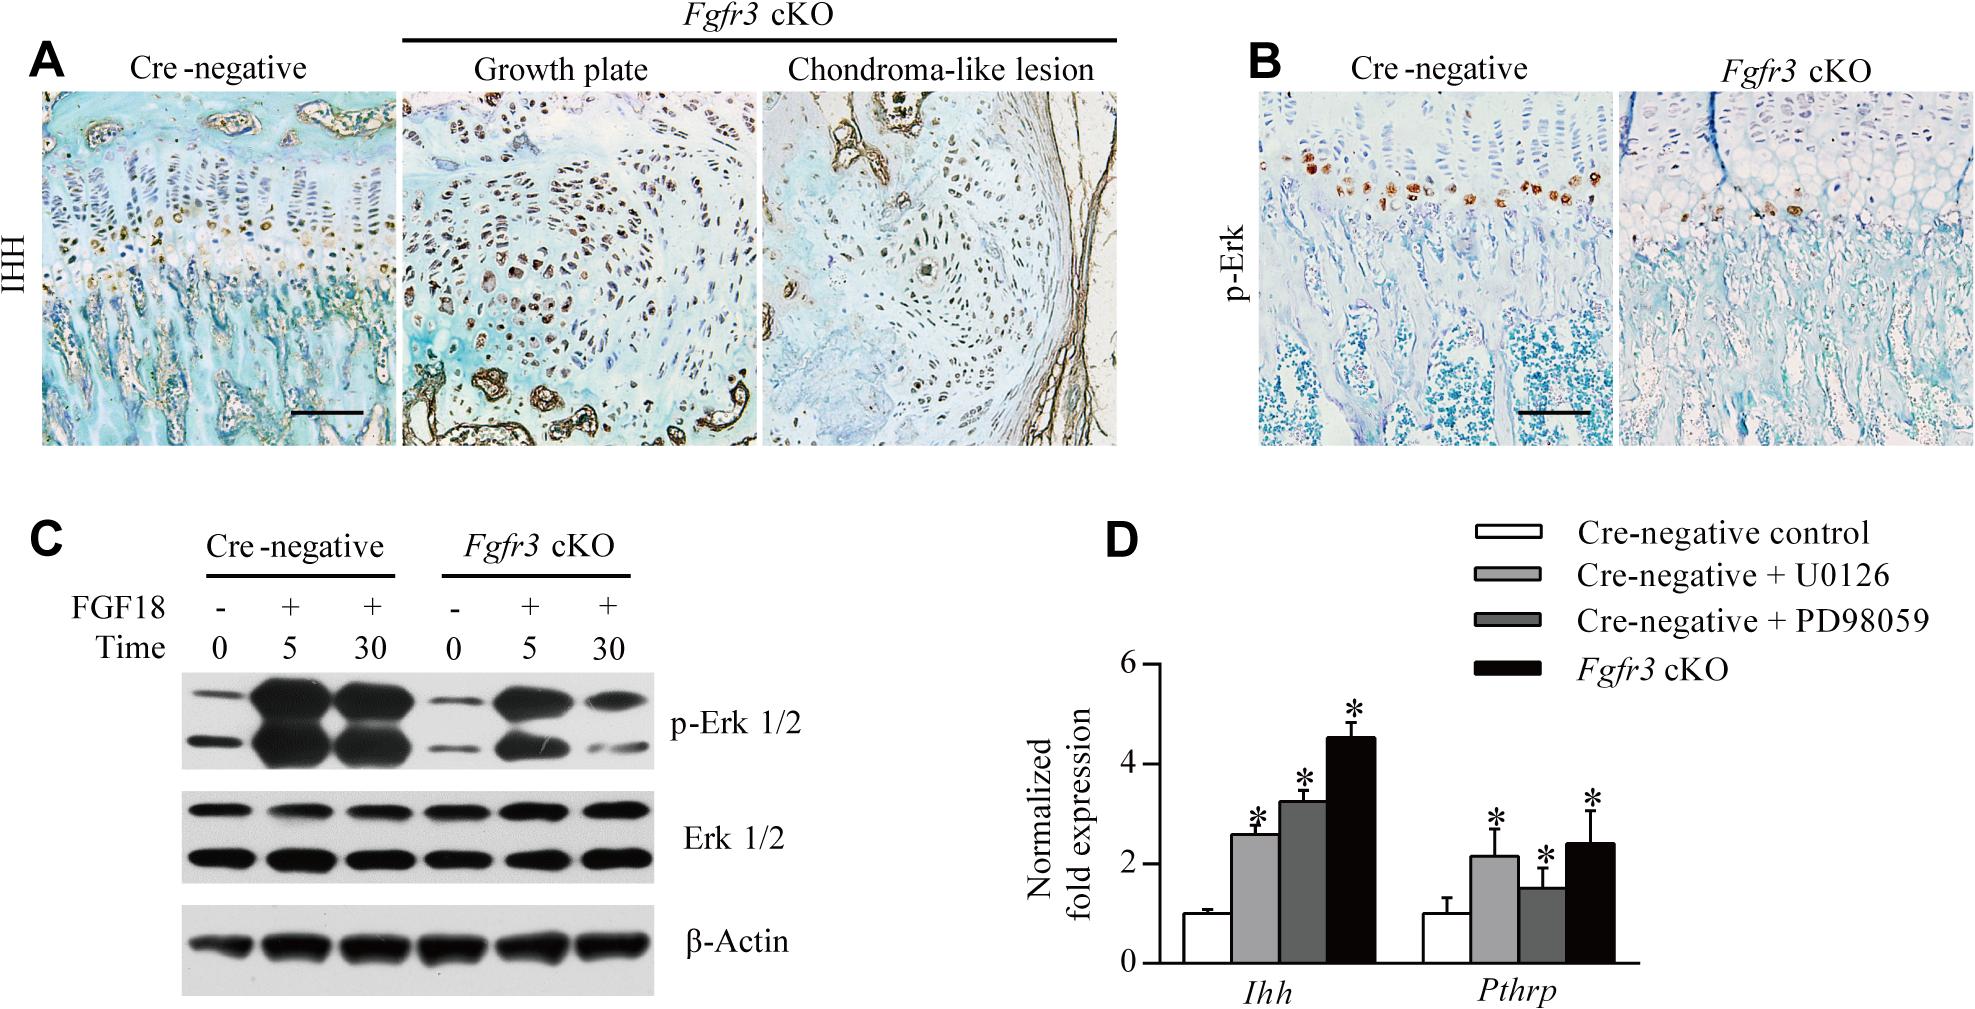 Loss of <i>Fgfr3</i> suppresses ERK activation but enhances IHH expression.